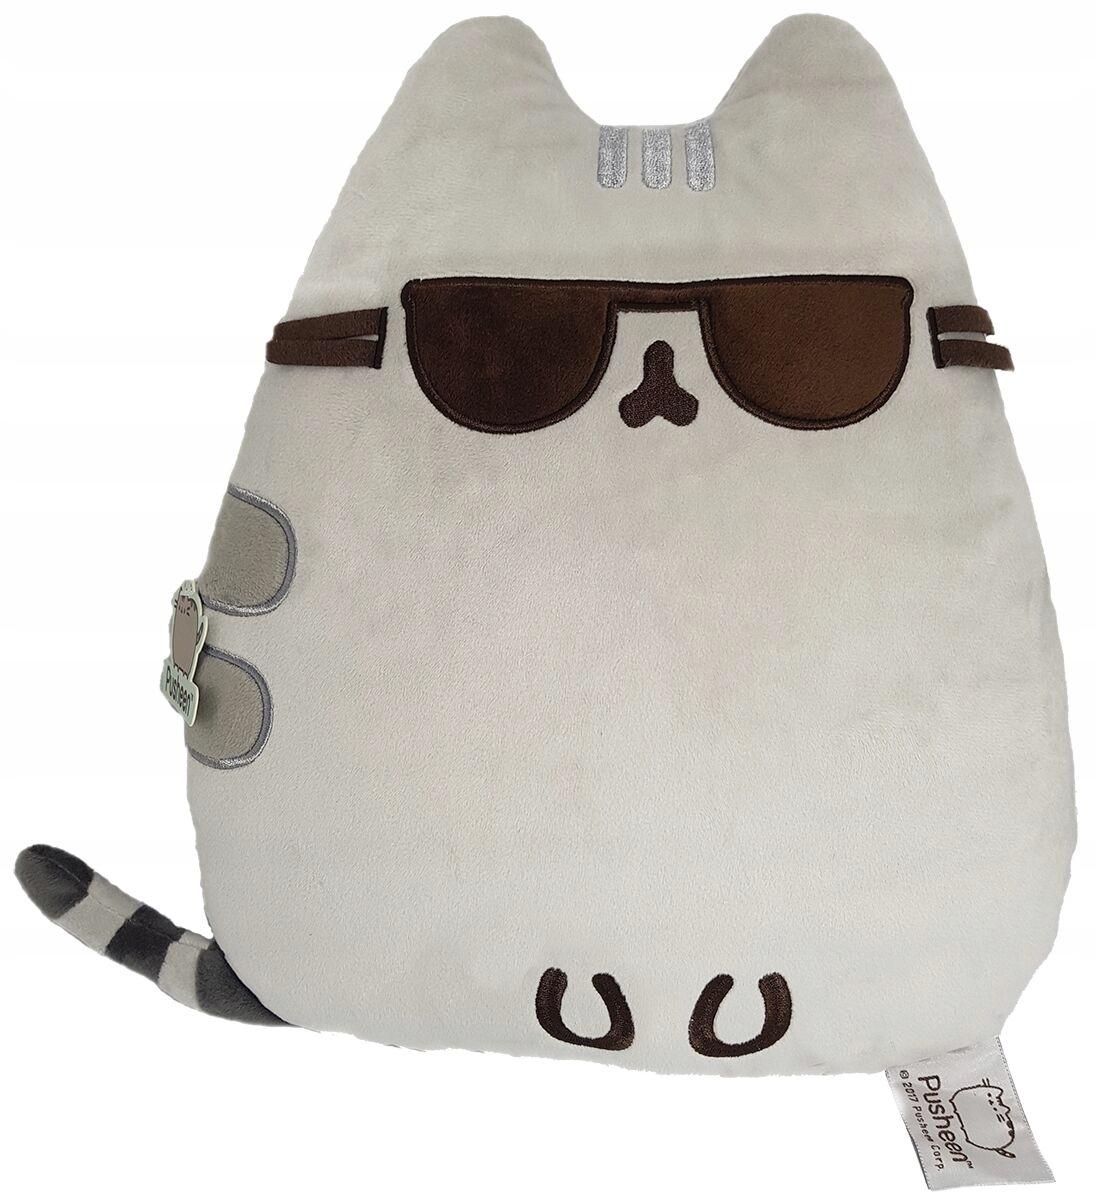 Mačka PUSHEEN JUMBO 102X85cm v okuliaroch GIANT